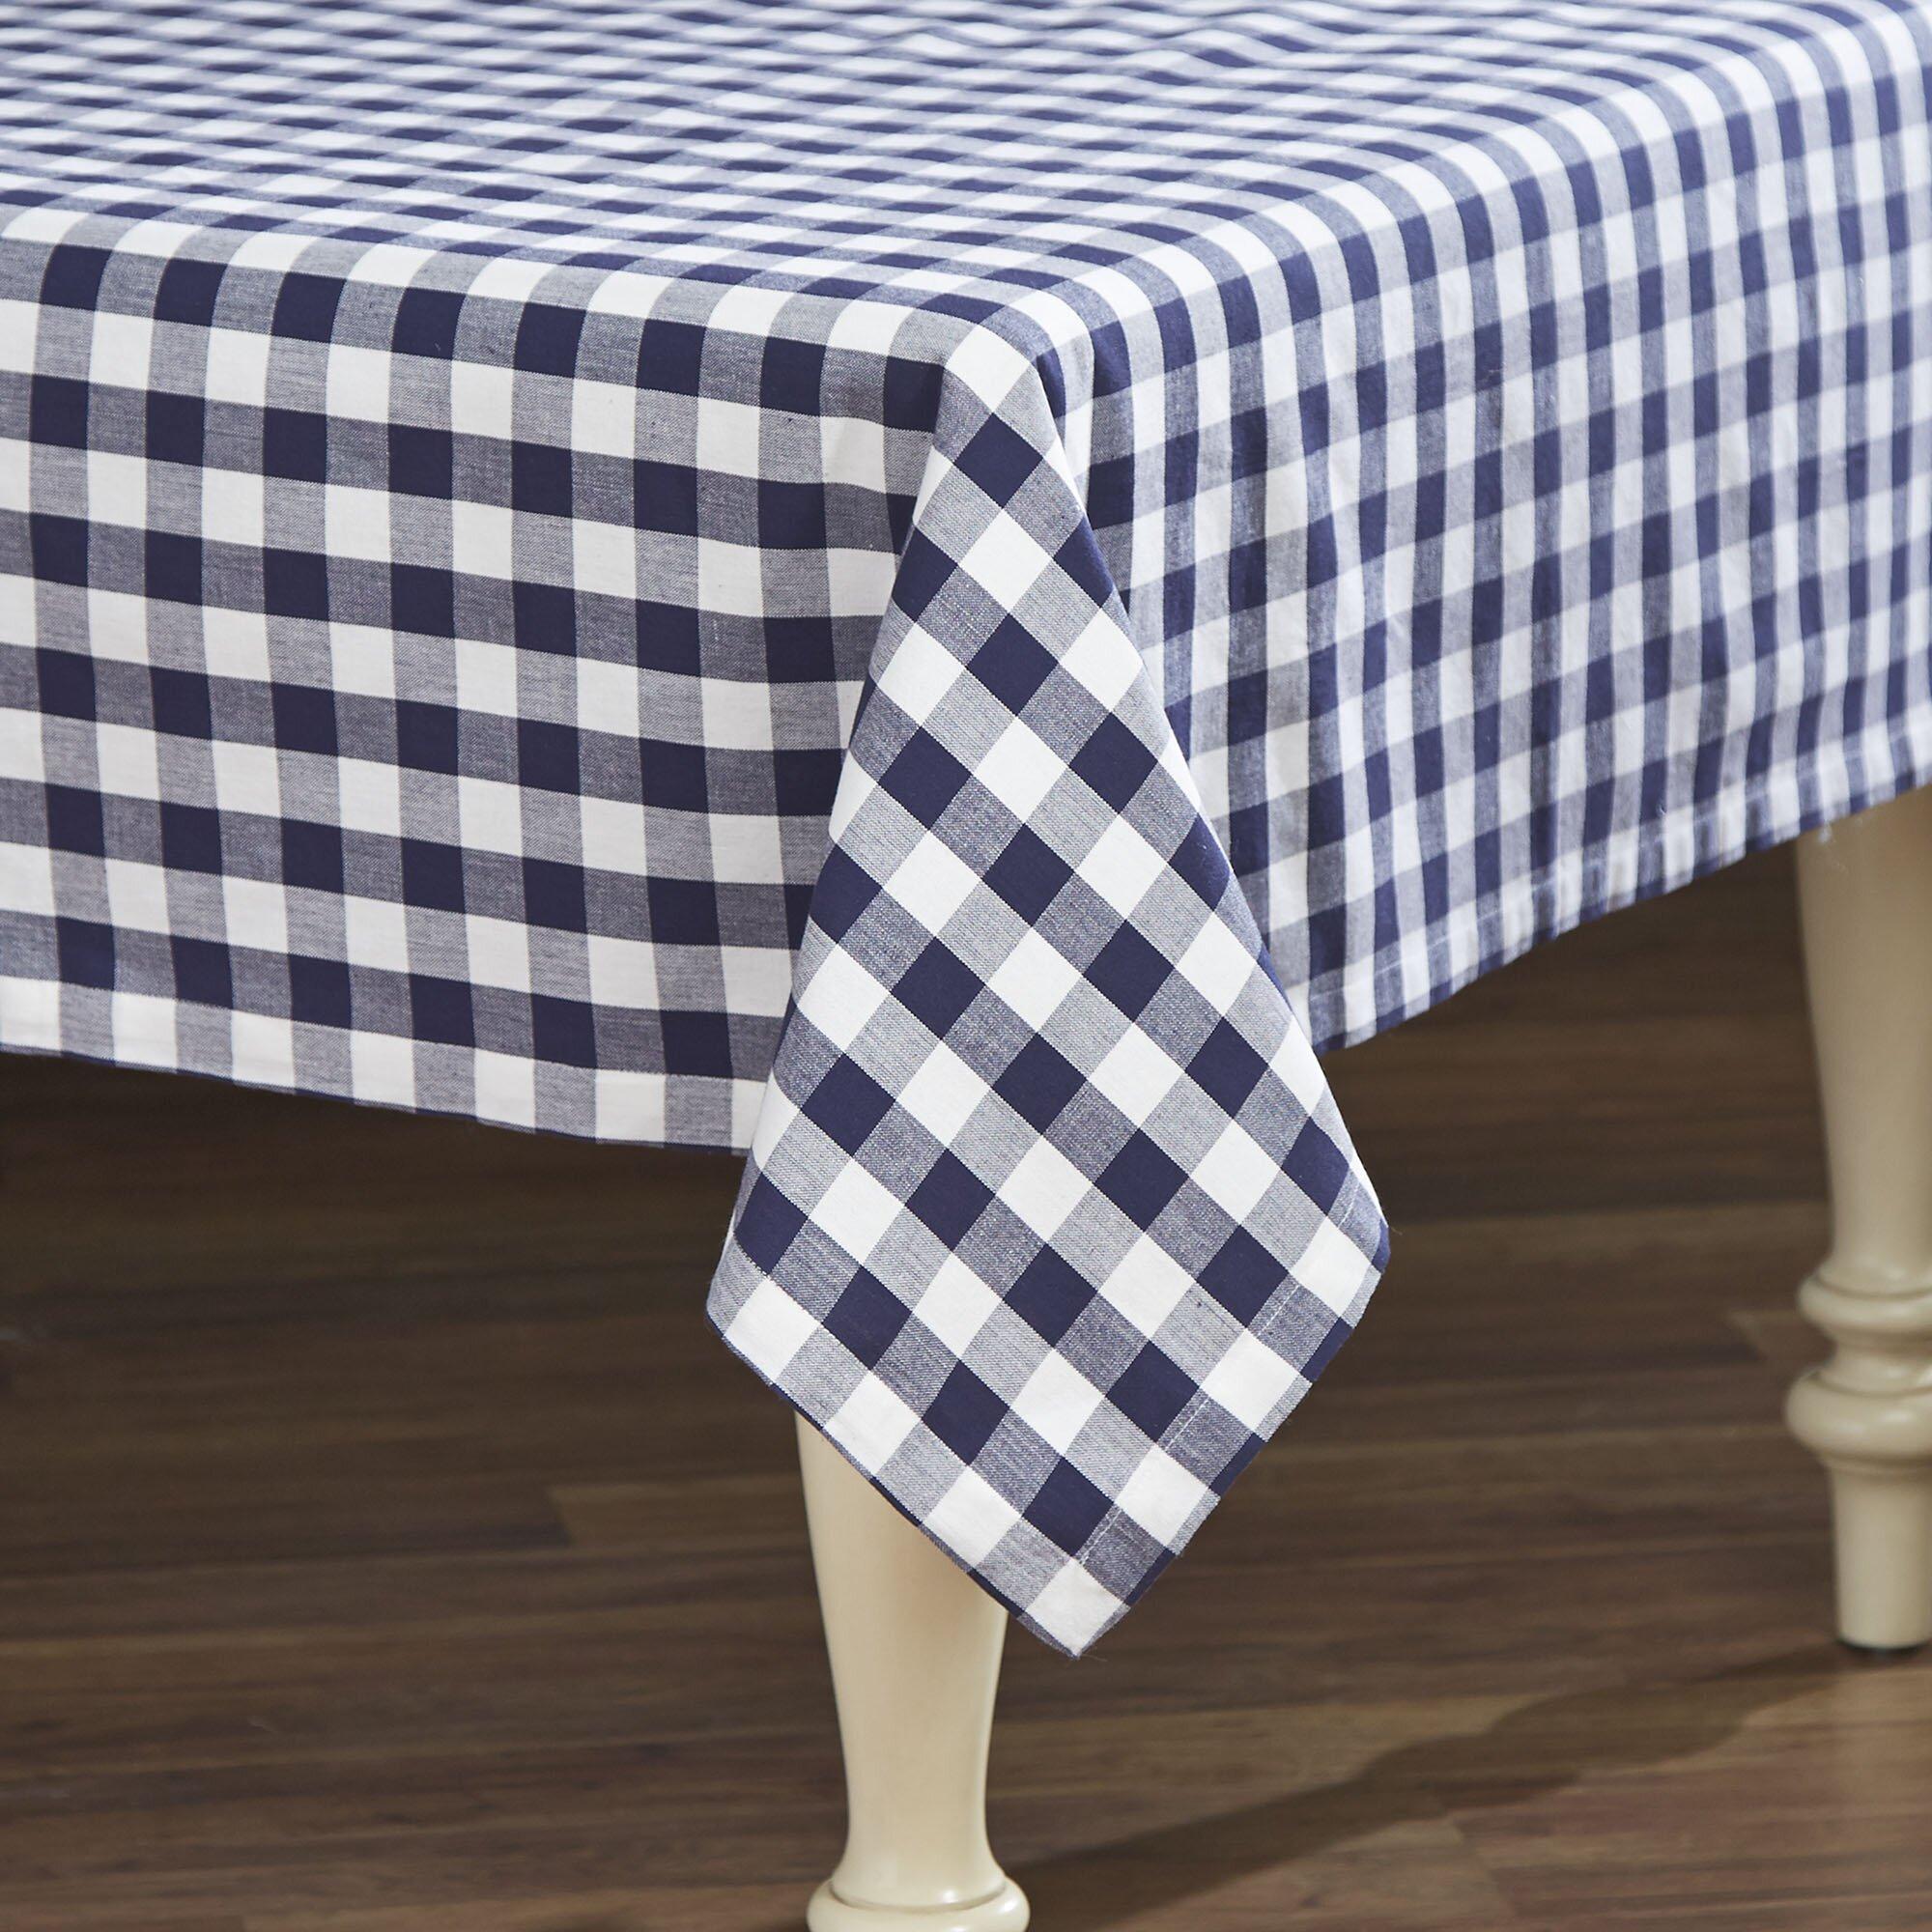 Design Imports Checker Table Cloth Reviews Wayfair